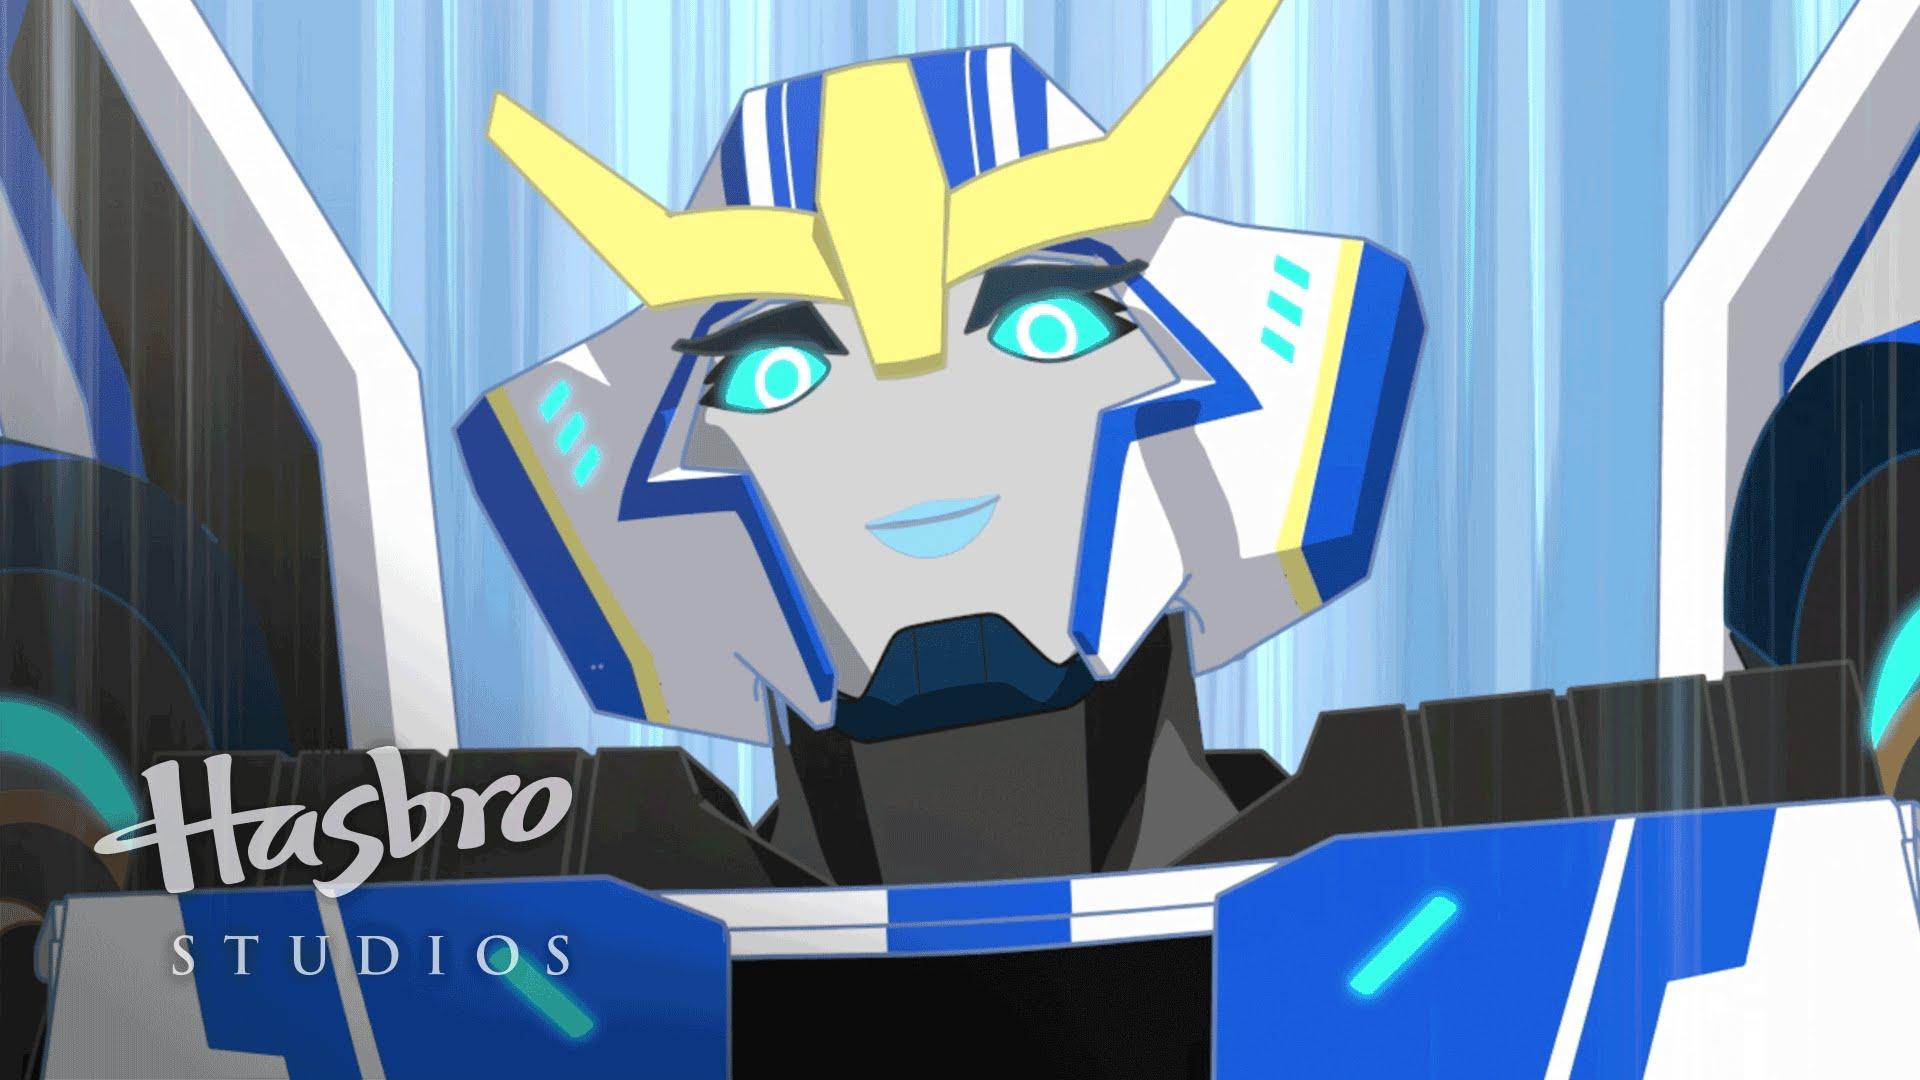 goodman transformer. voice actor: john goodman (english). transformer